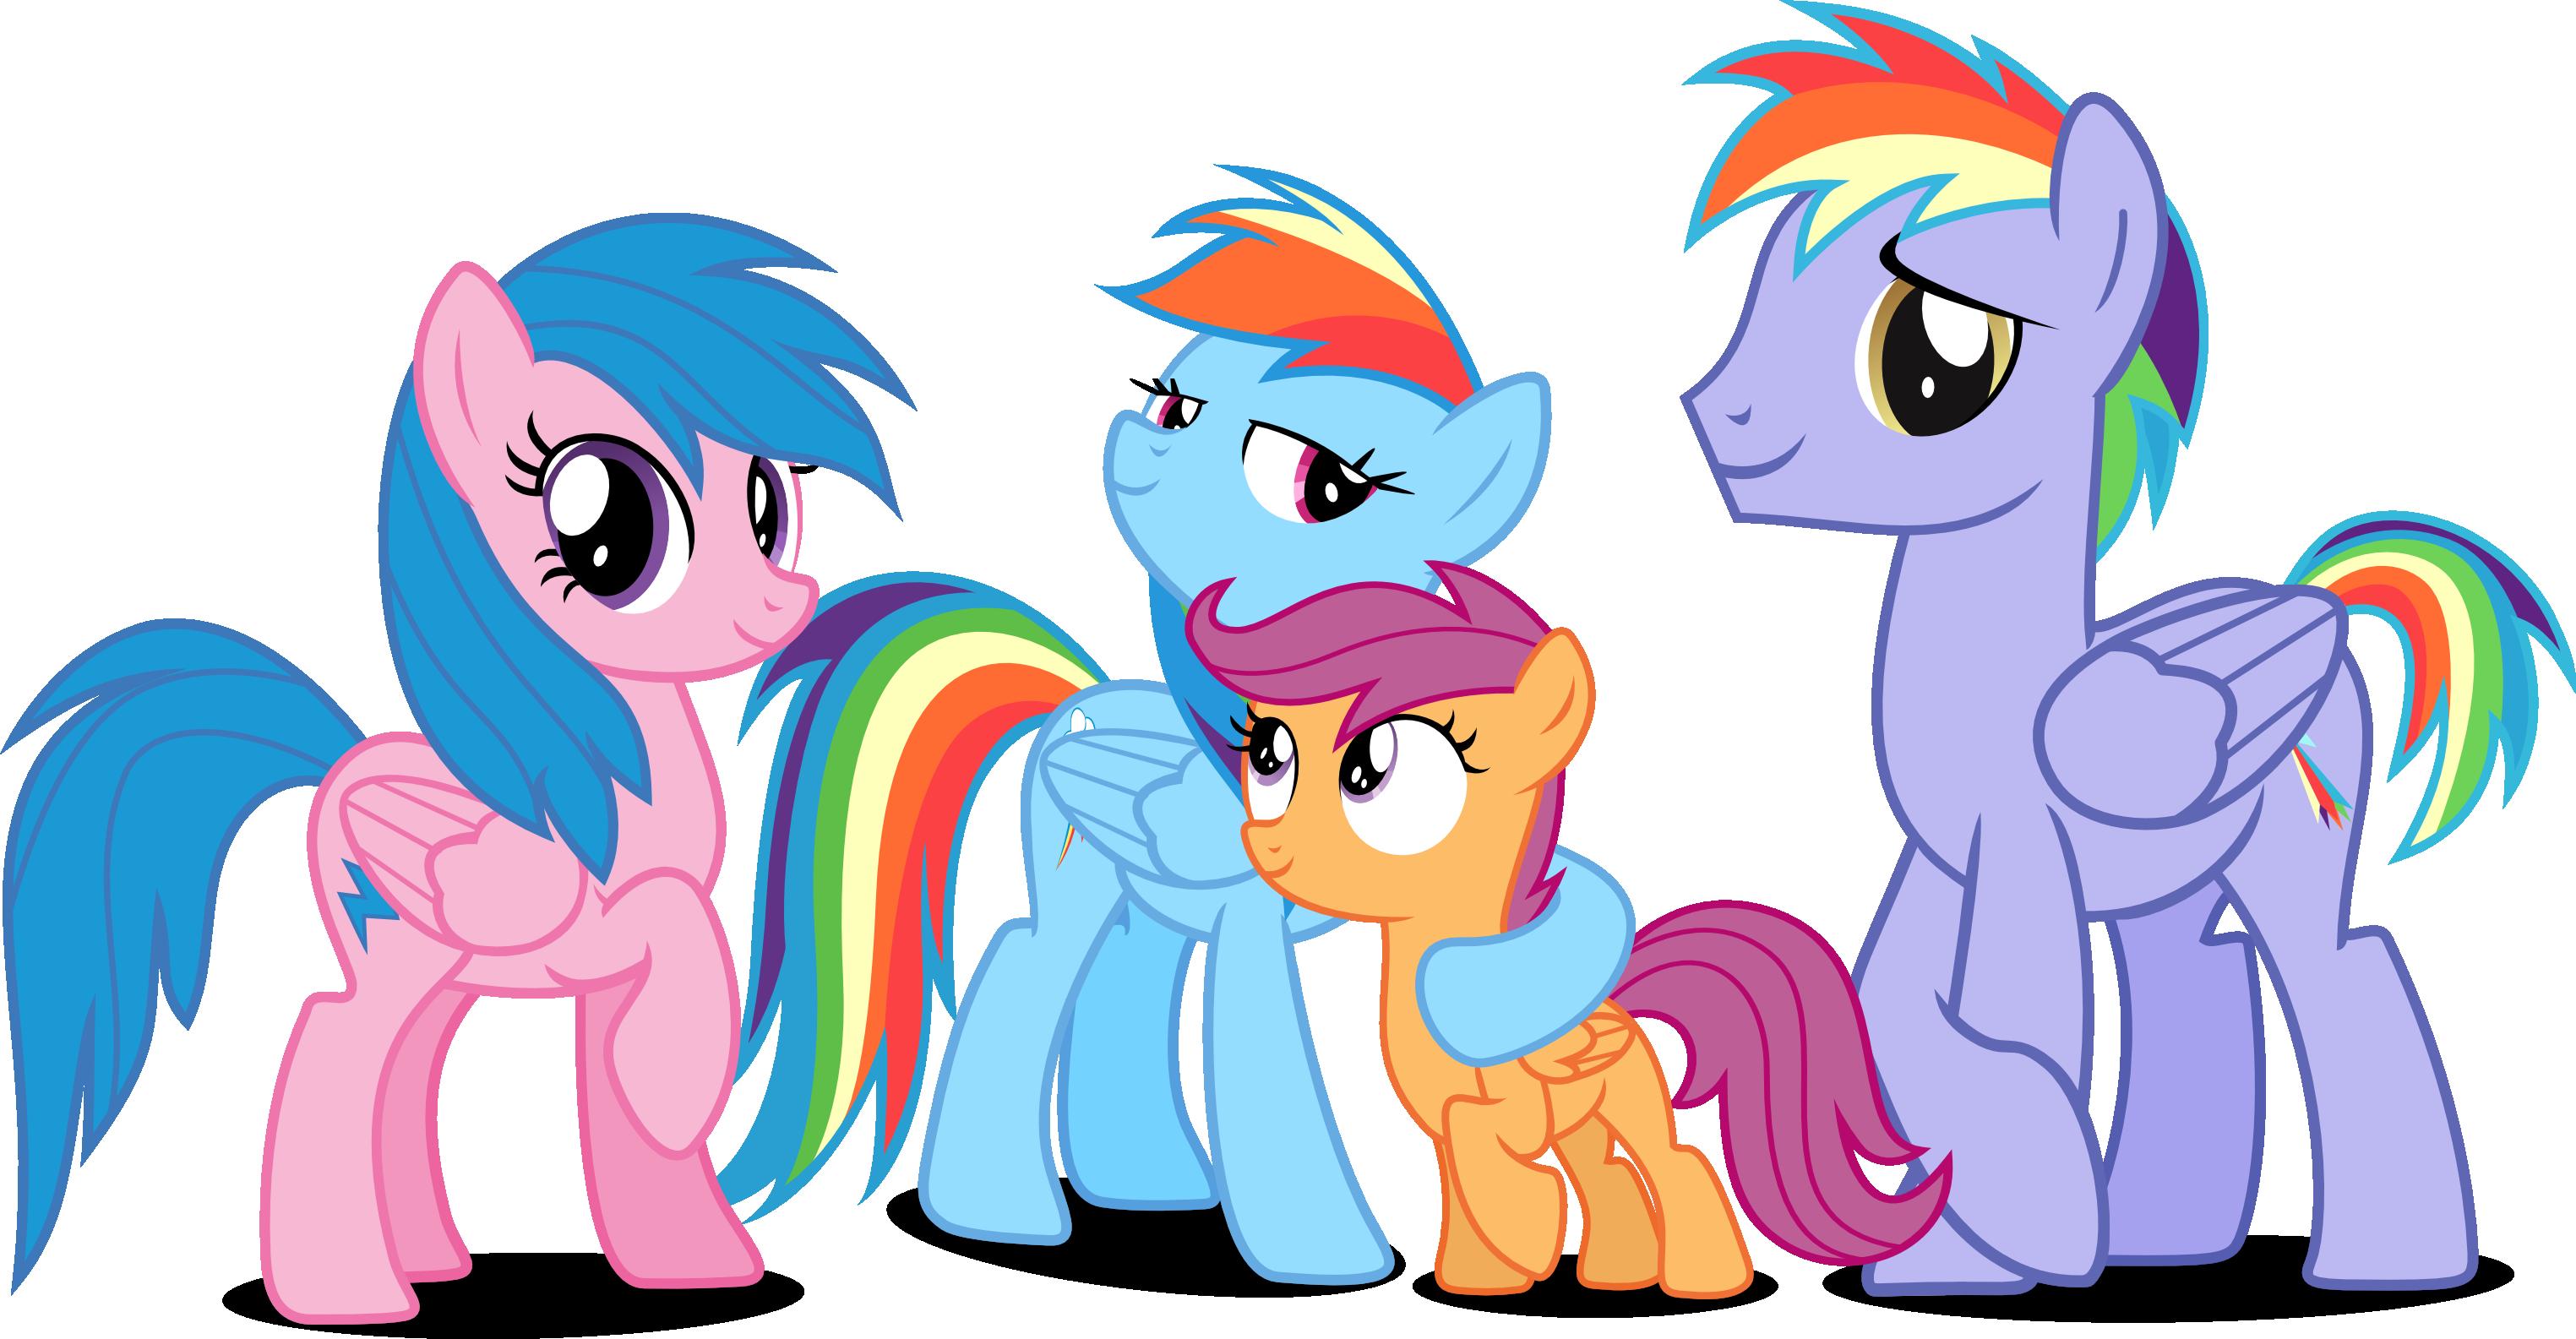 rainbow dashs family by vectorbrony on deviantart